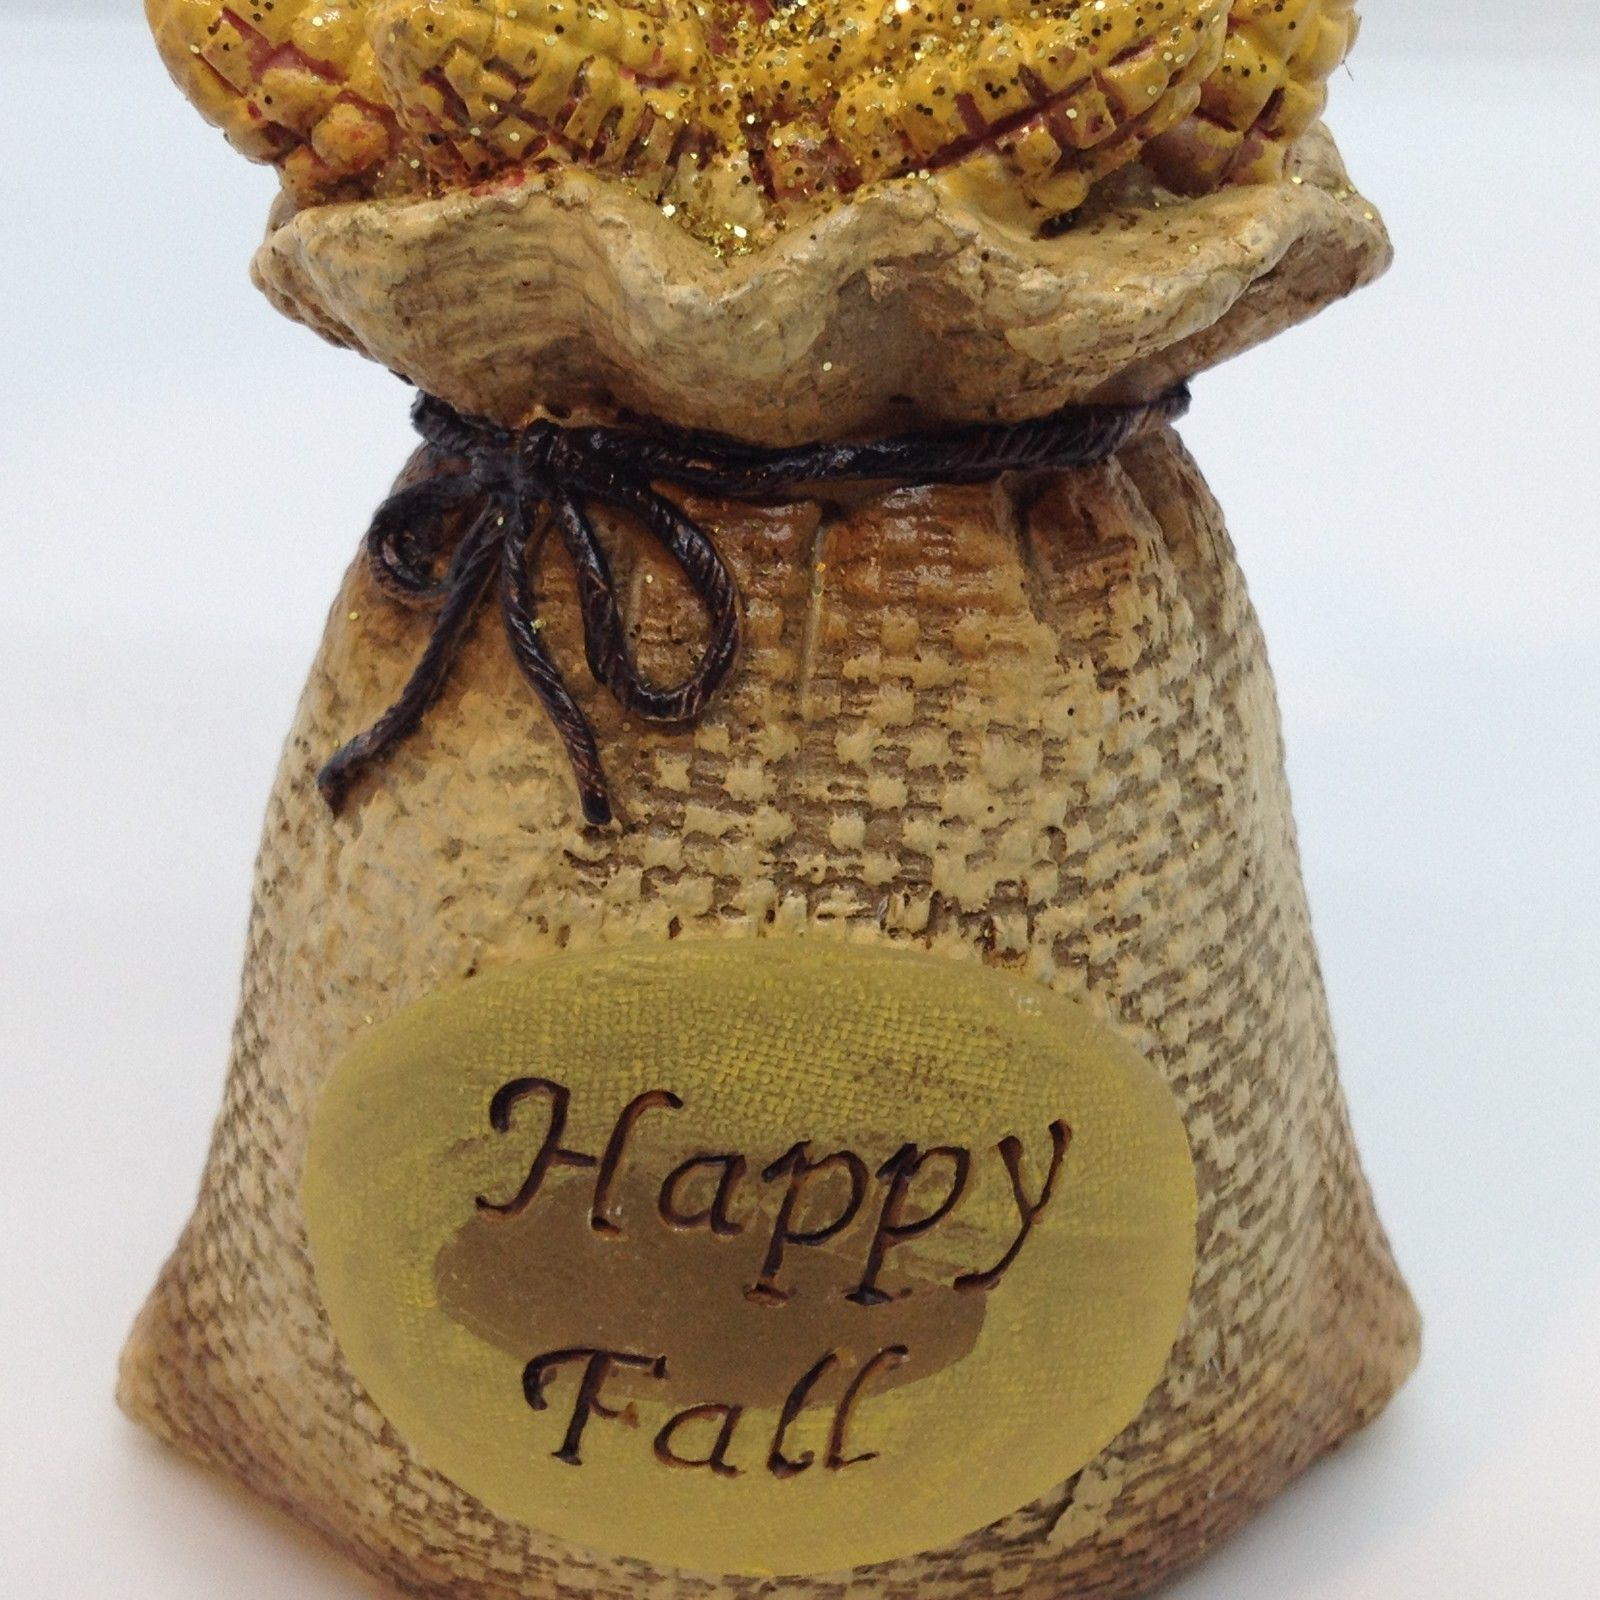 "HAPPY FALL BIRD FIGURINE Light Up Thanksgiving Corn Cob Home Decor Gift 6"""